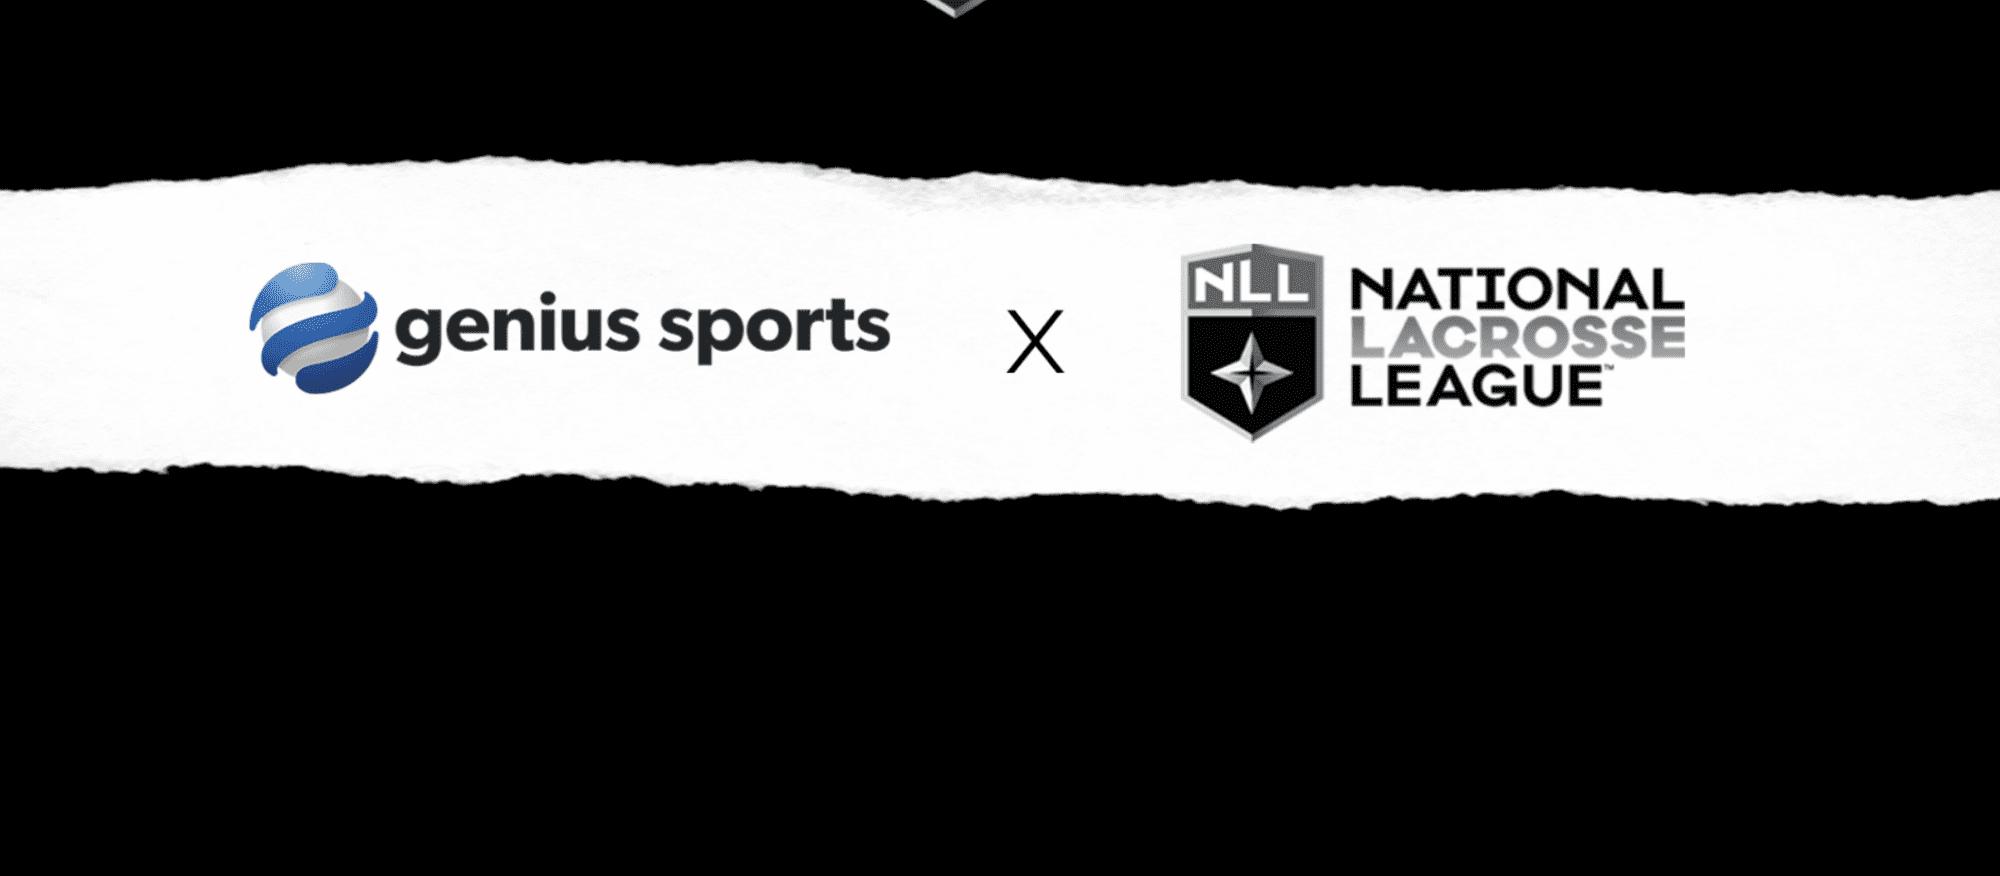 nll national lacrosse league genius sports